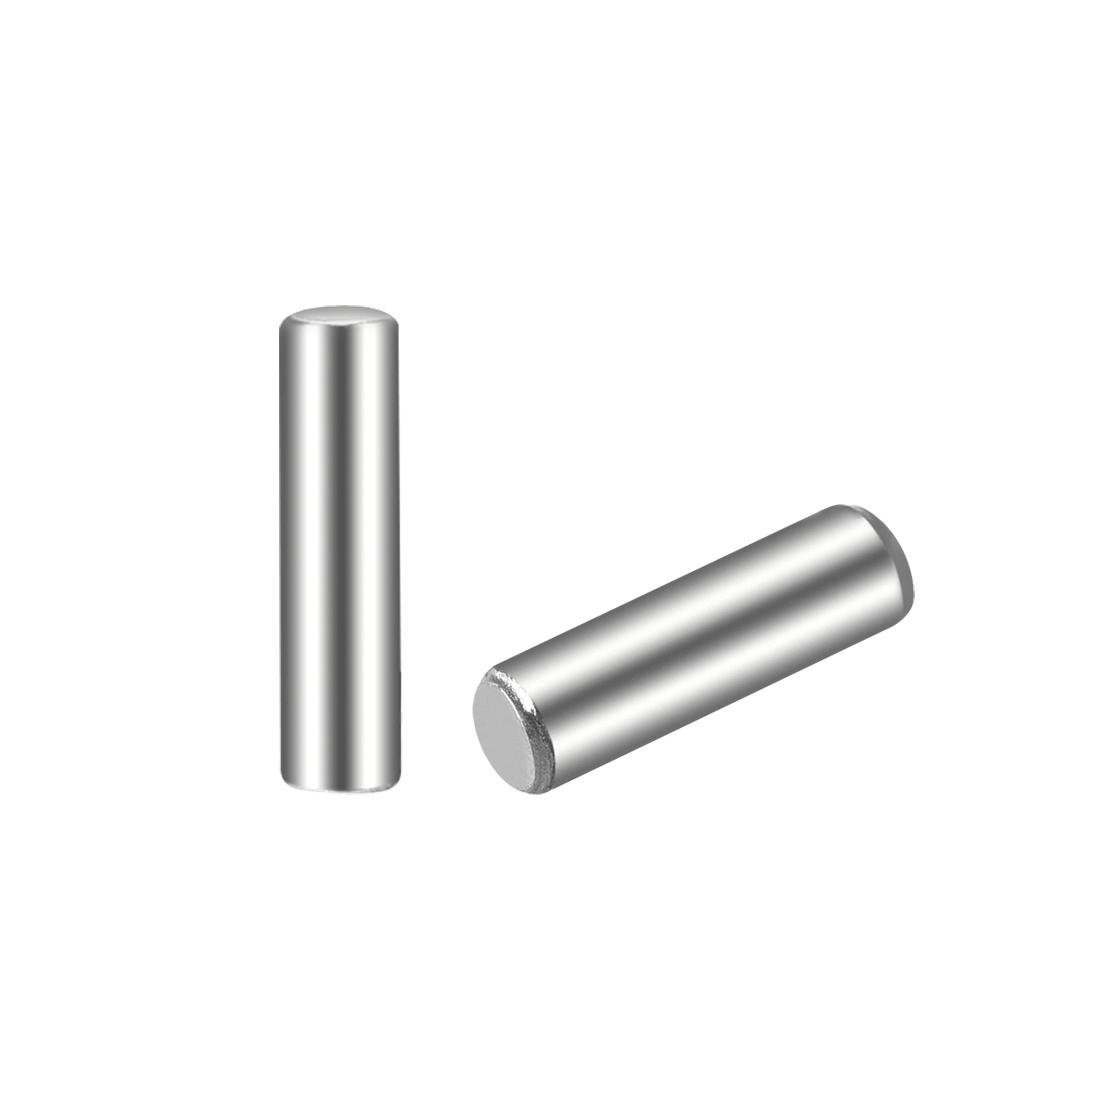 50Pcs 2.5mm x 10mm Dowel Pin 304 Stainless Steel Shelf Support Pin Fasten